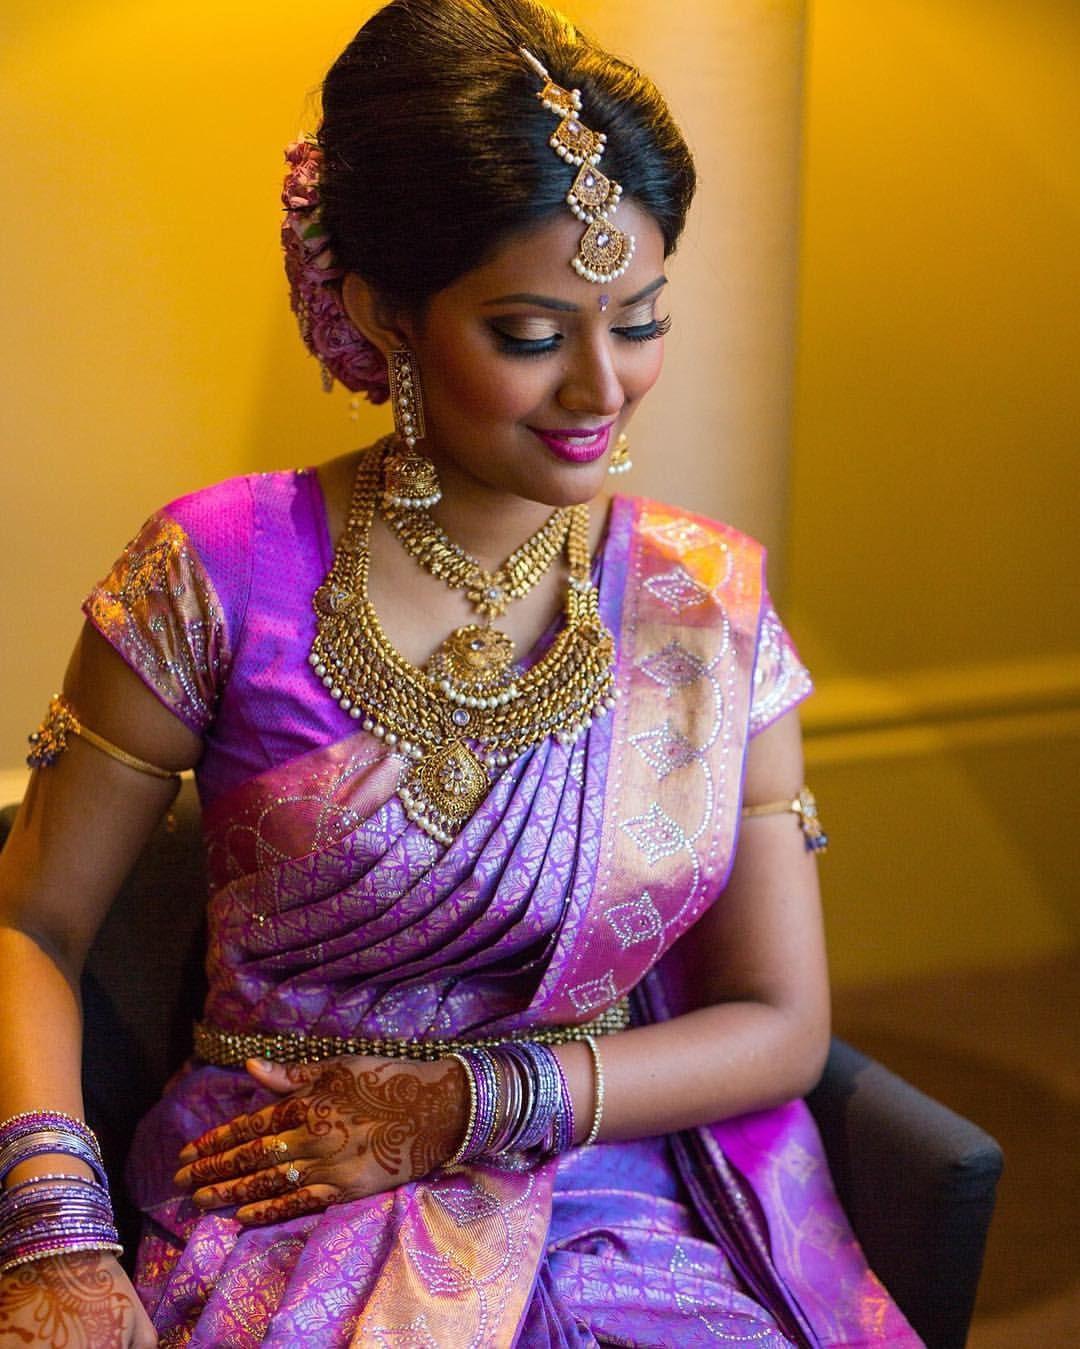 Wedding Sarees For Bride Kerala Hindu: South Indian Bride. Gold Indian Bridal Jewelry.Temple